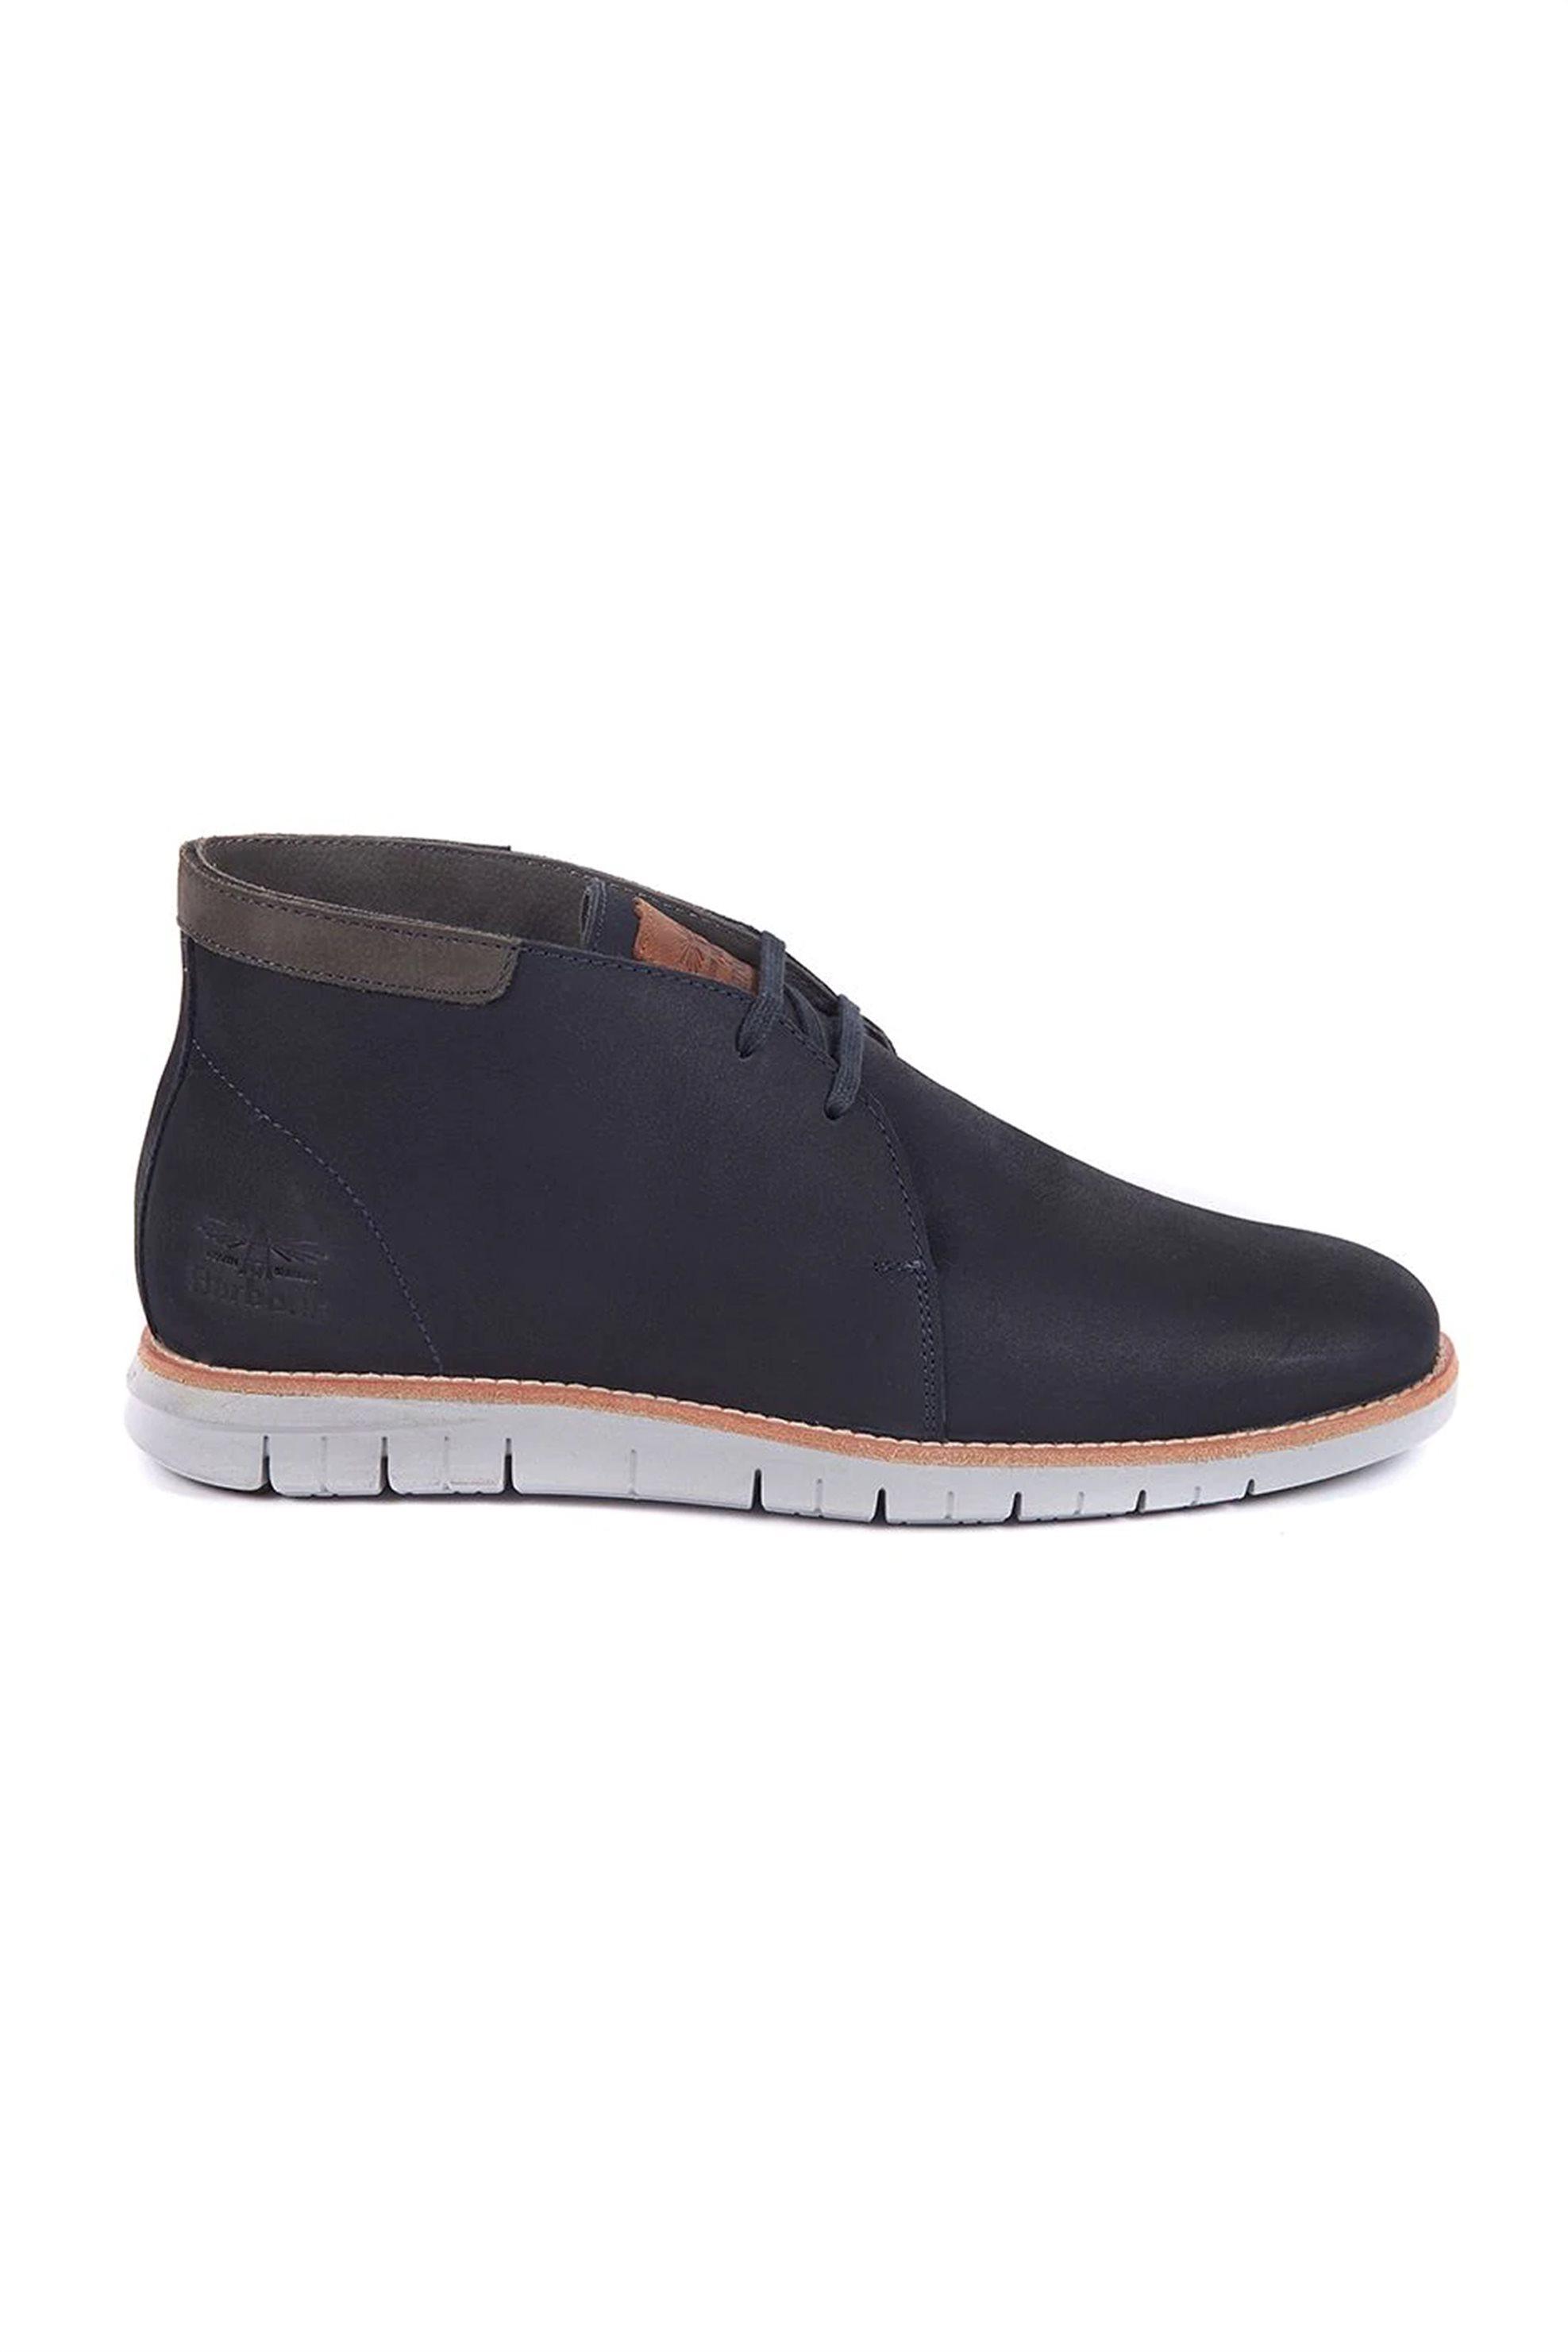 "Barbour ανδρικά μποτάκια με κορδόνια ""Boughton Boots"" – MFO0428 – Μπλε Σκούρο"